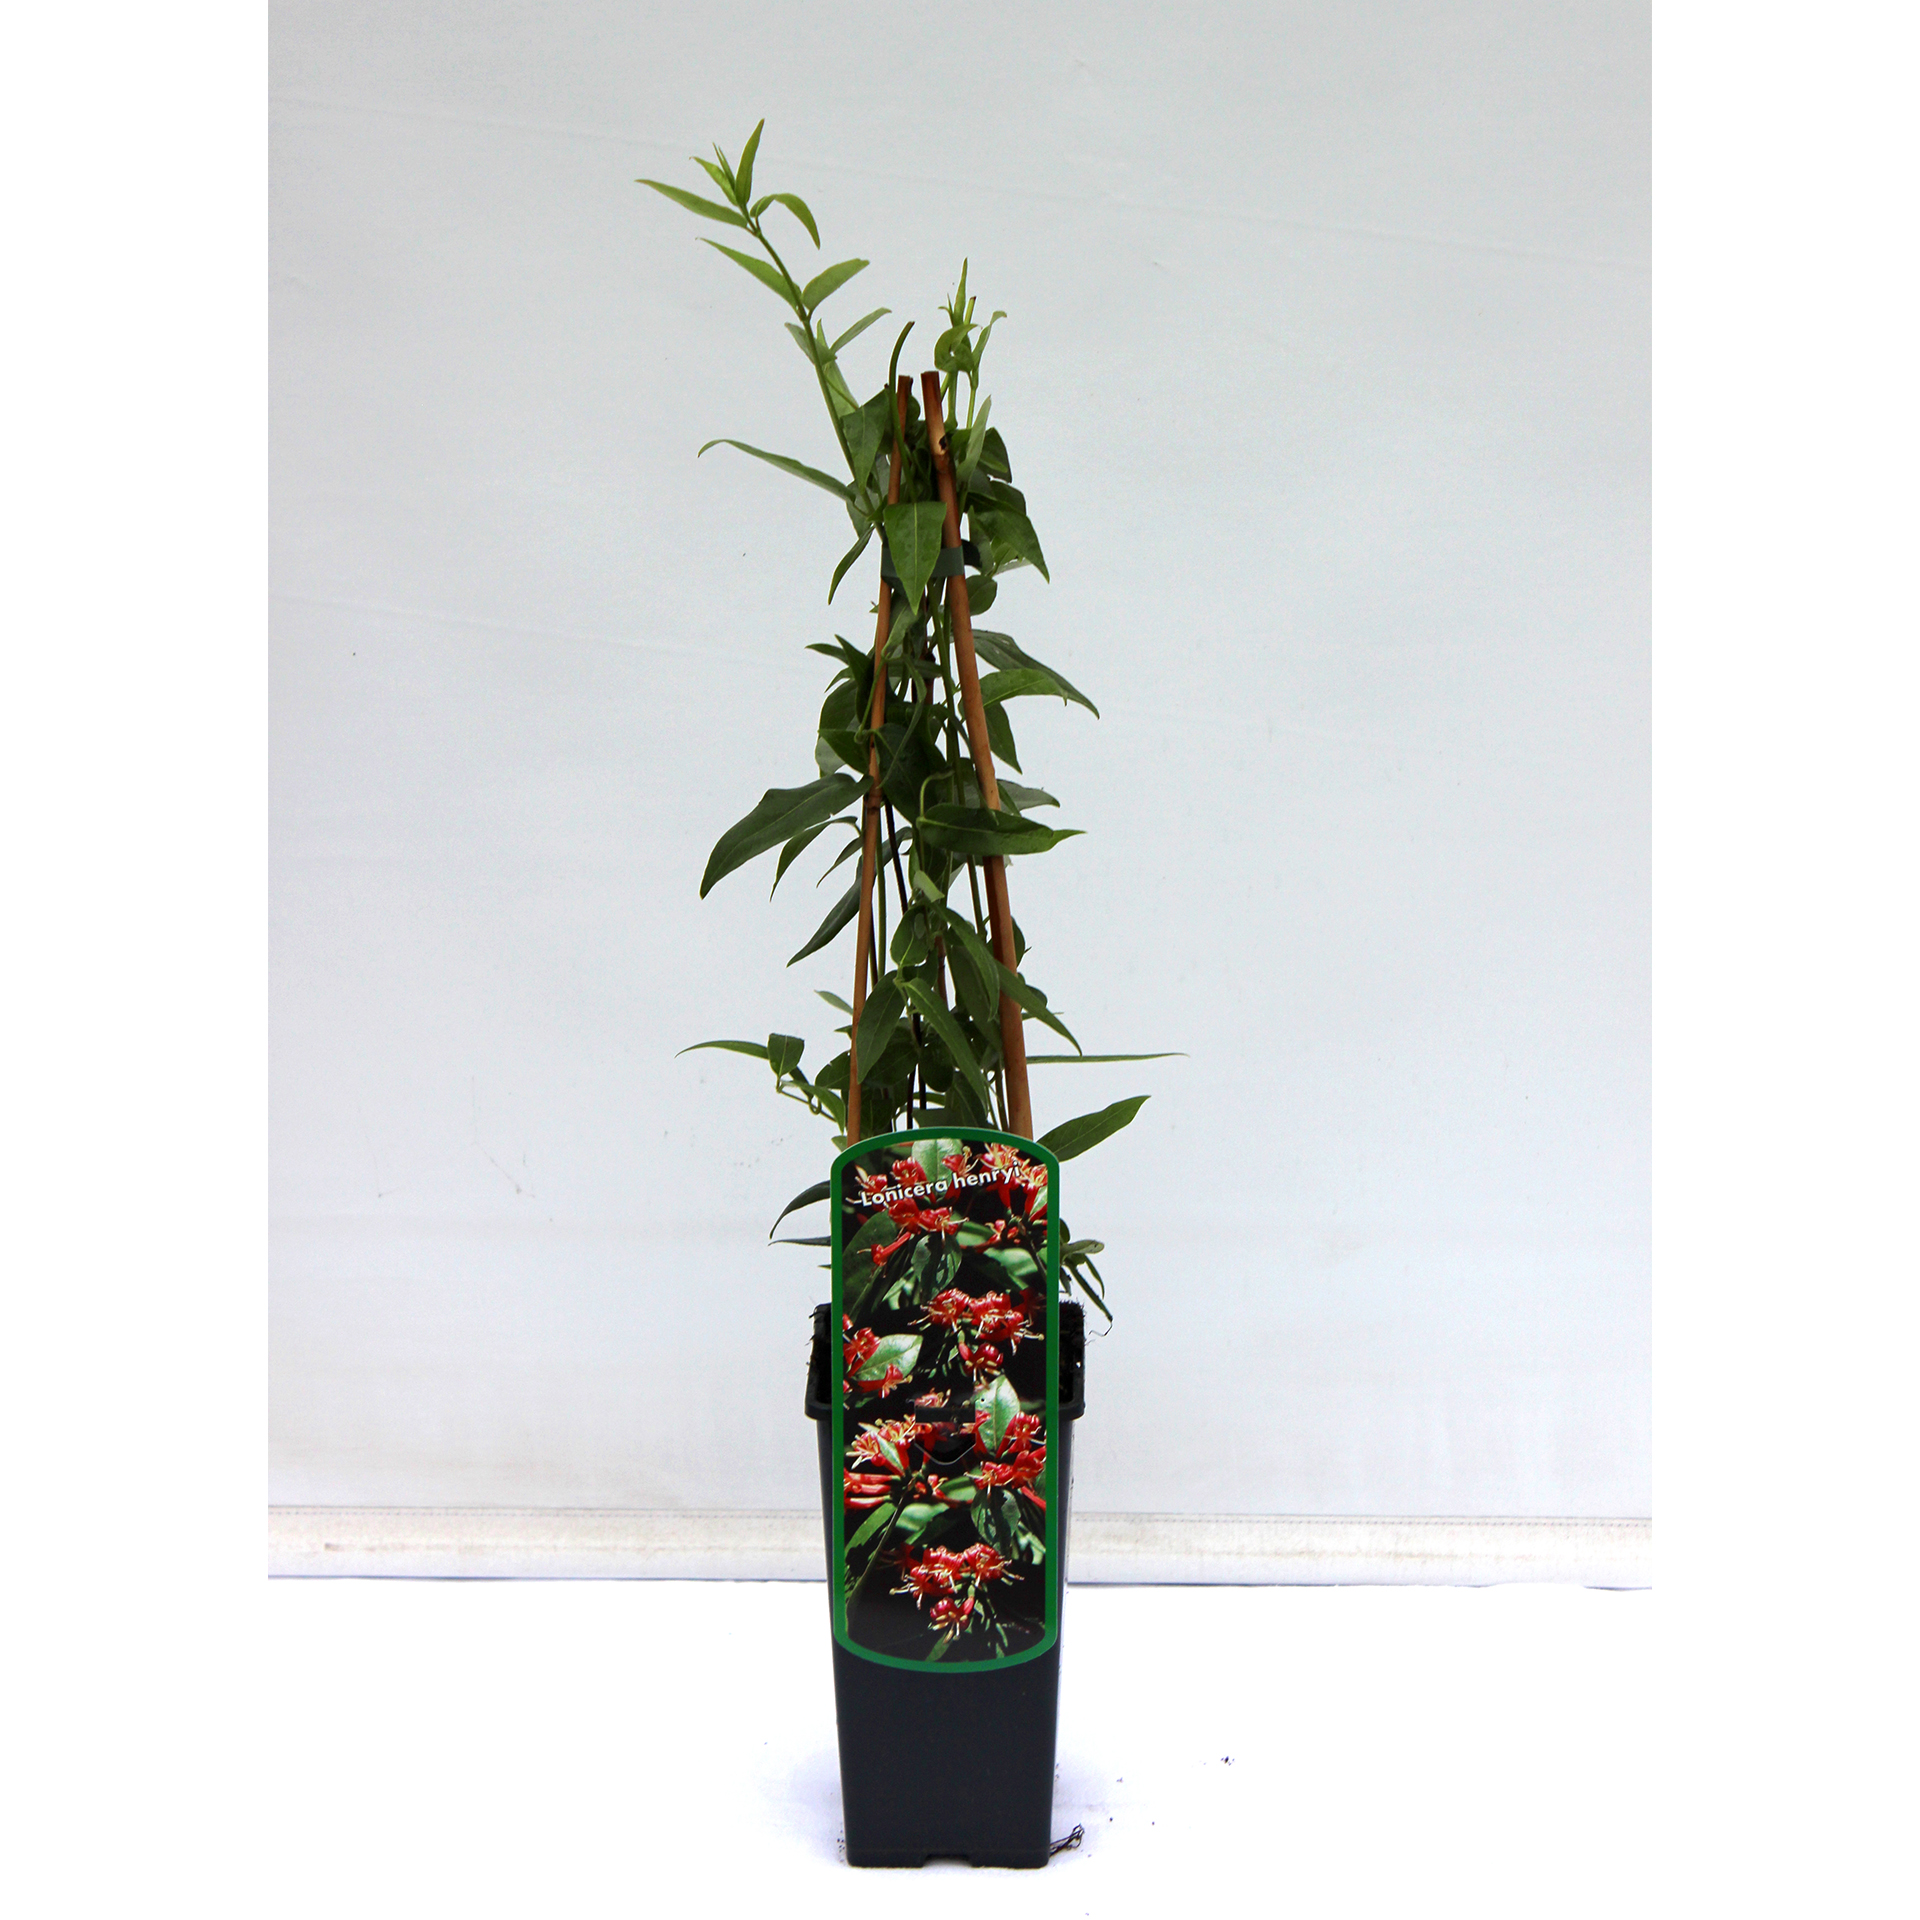 Immergrünes Geißblatt - Lonicera henryi, C2eck 40-60cm